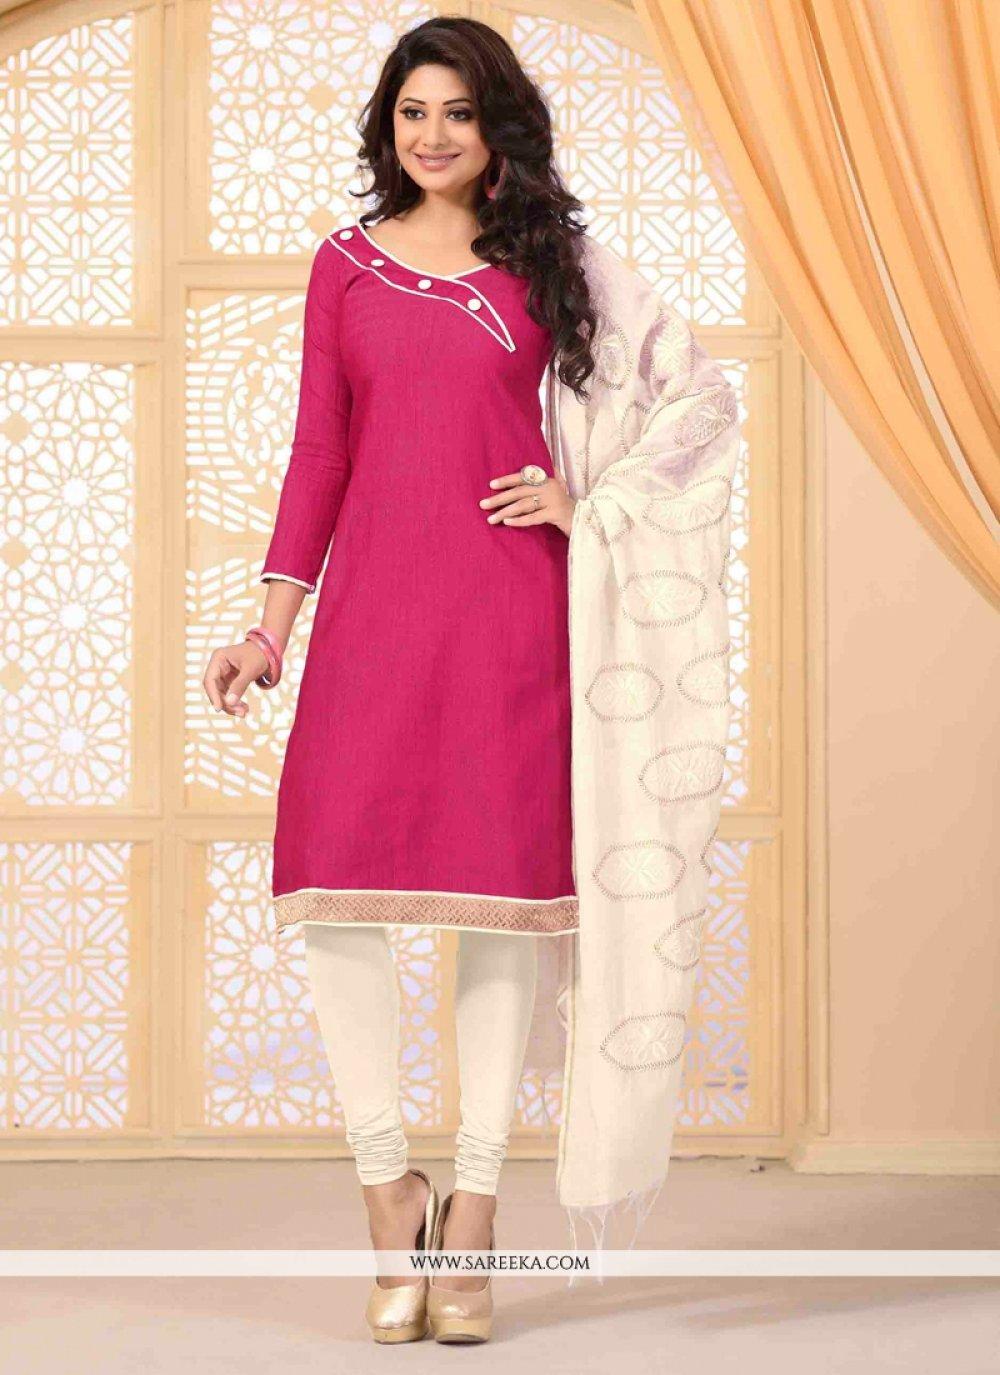 Lace Work Hot Pink Jute Silk Churidar Salwar Kameez